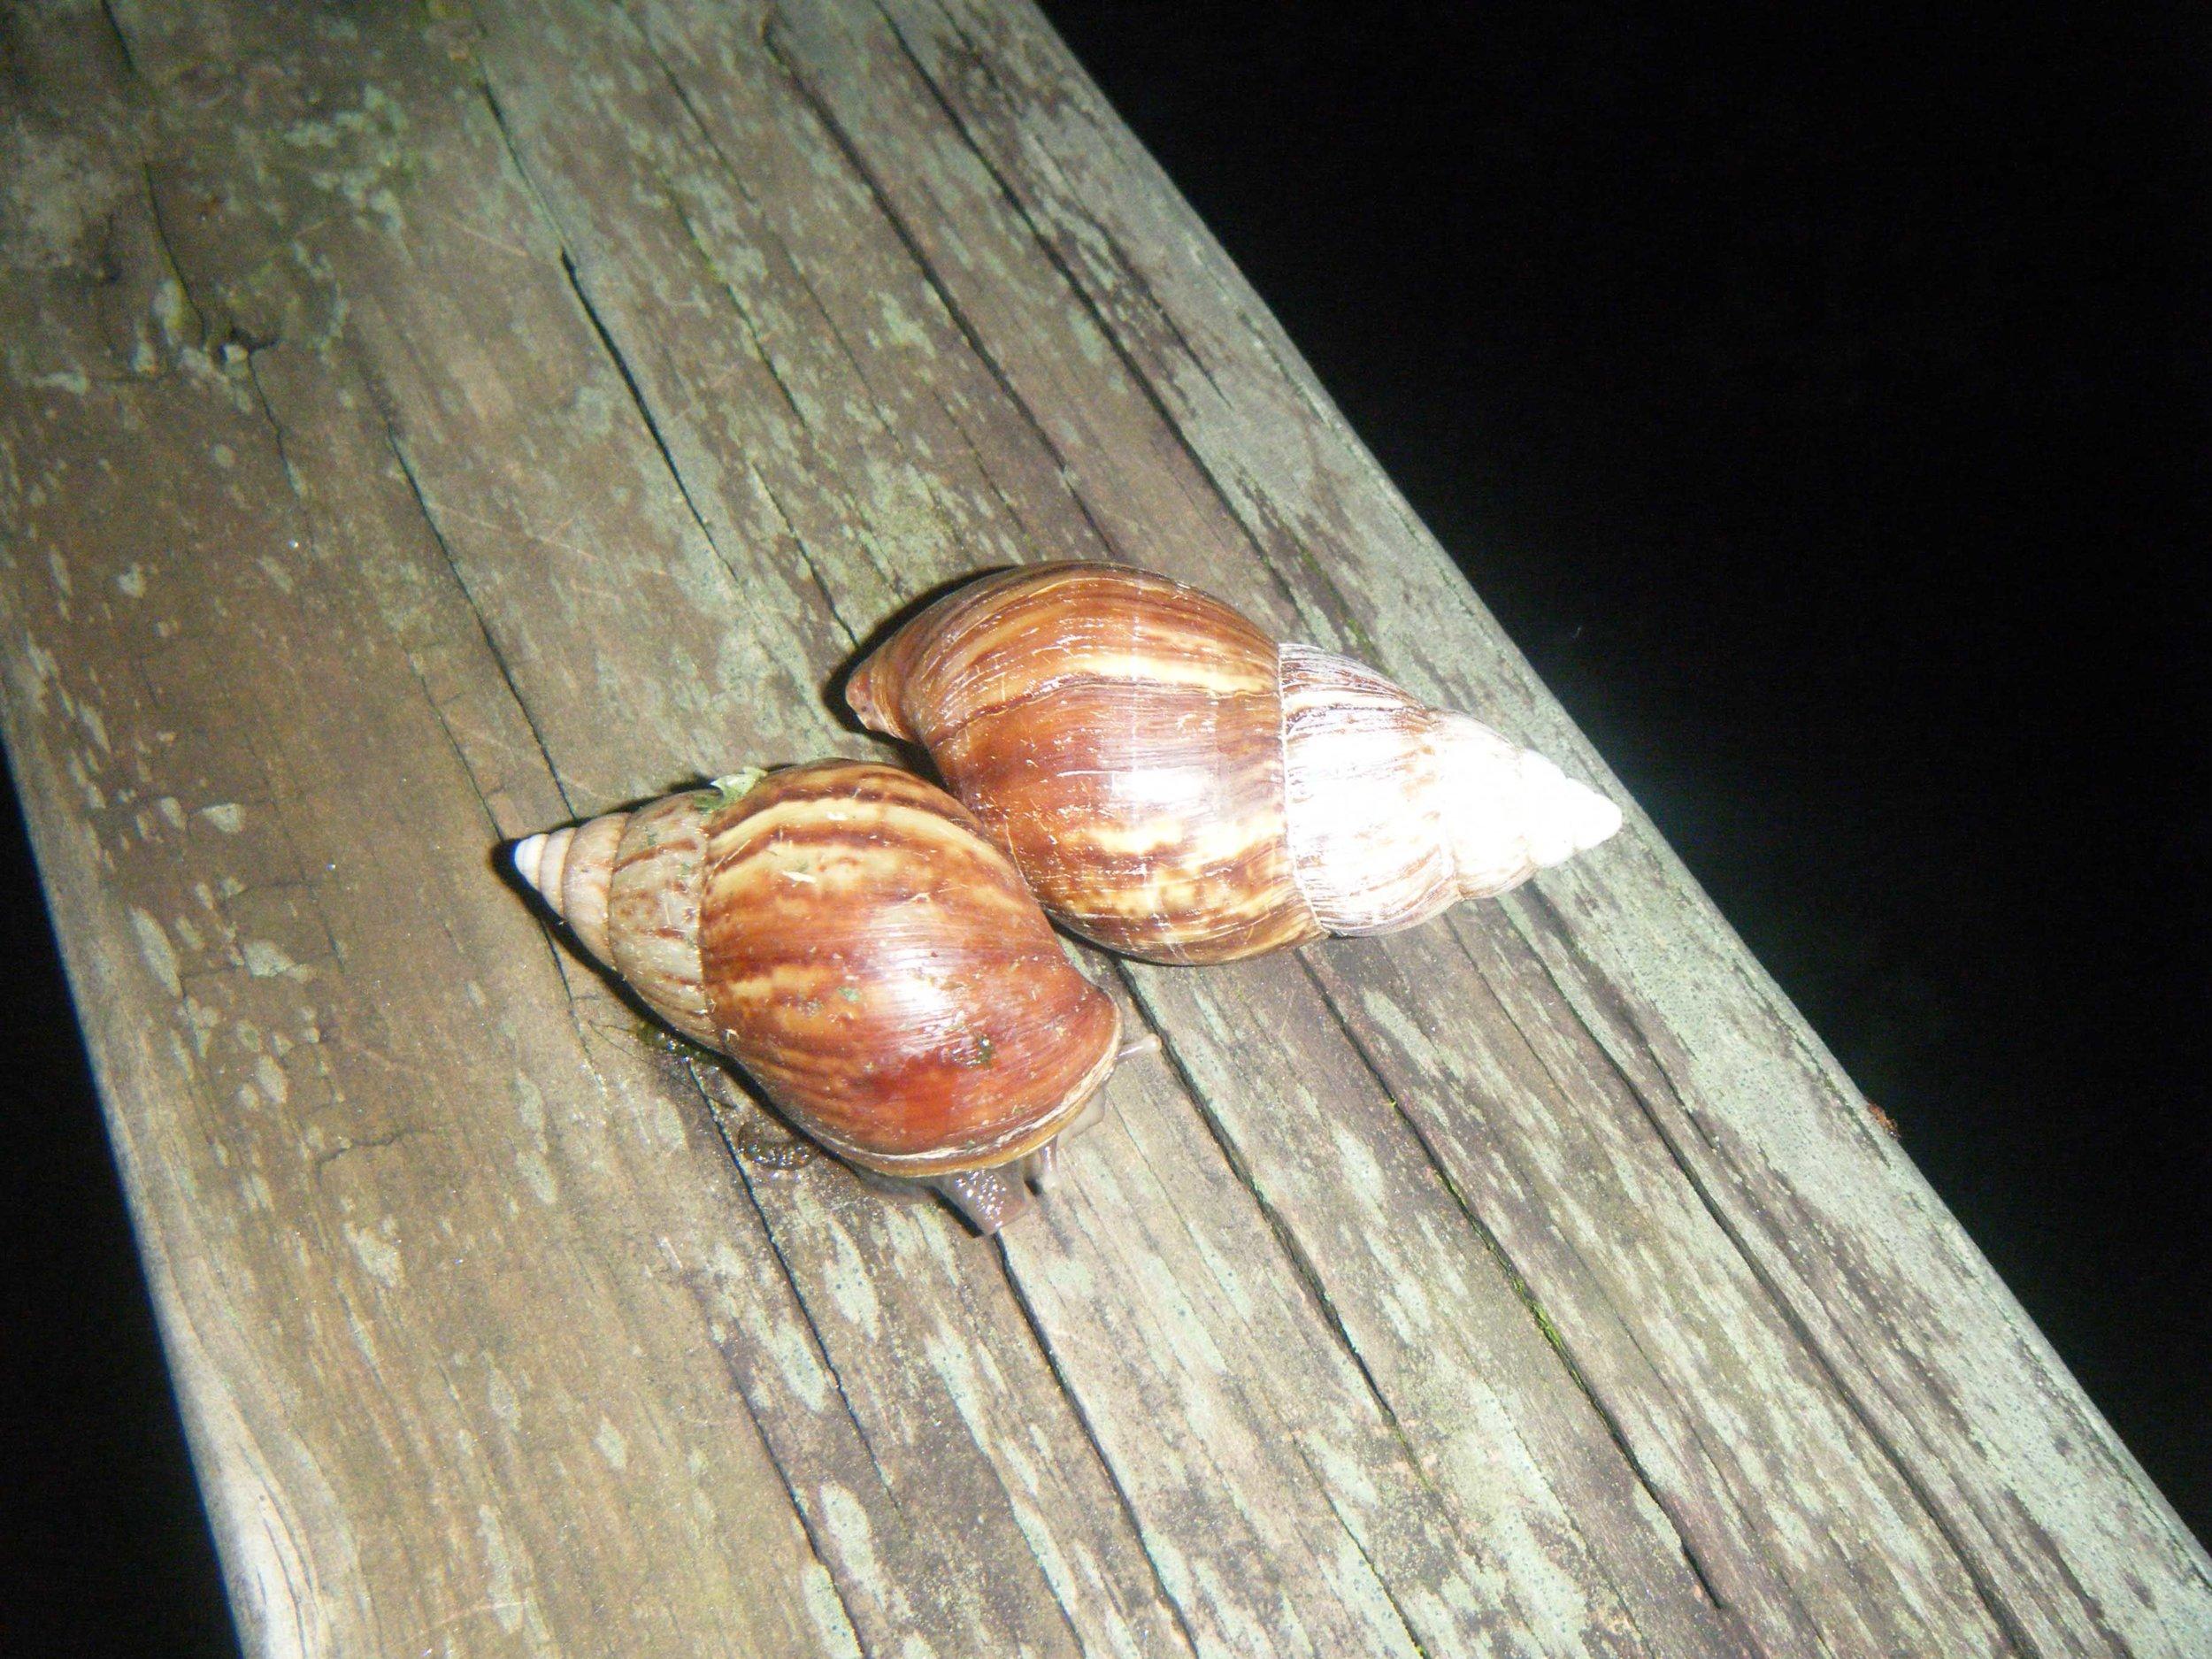 night snail action.jpg